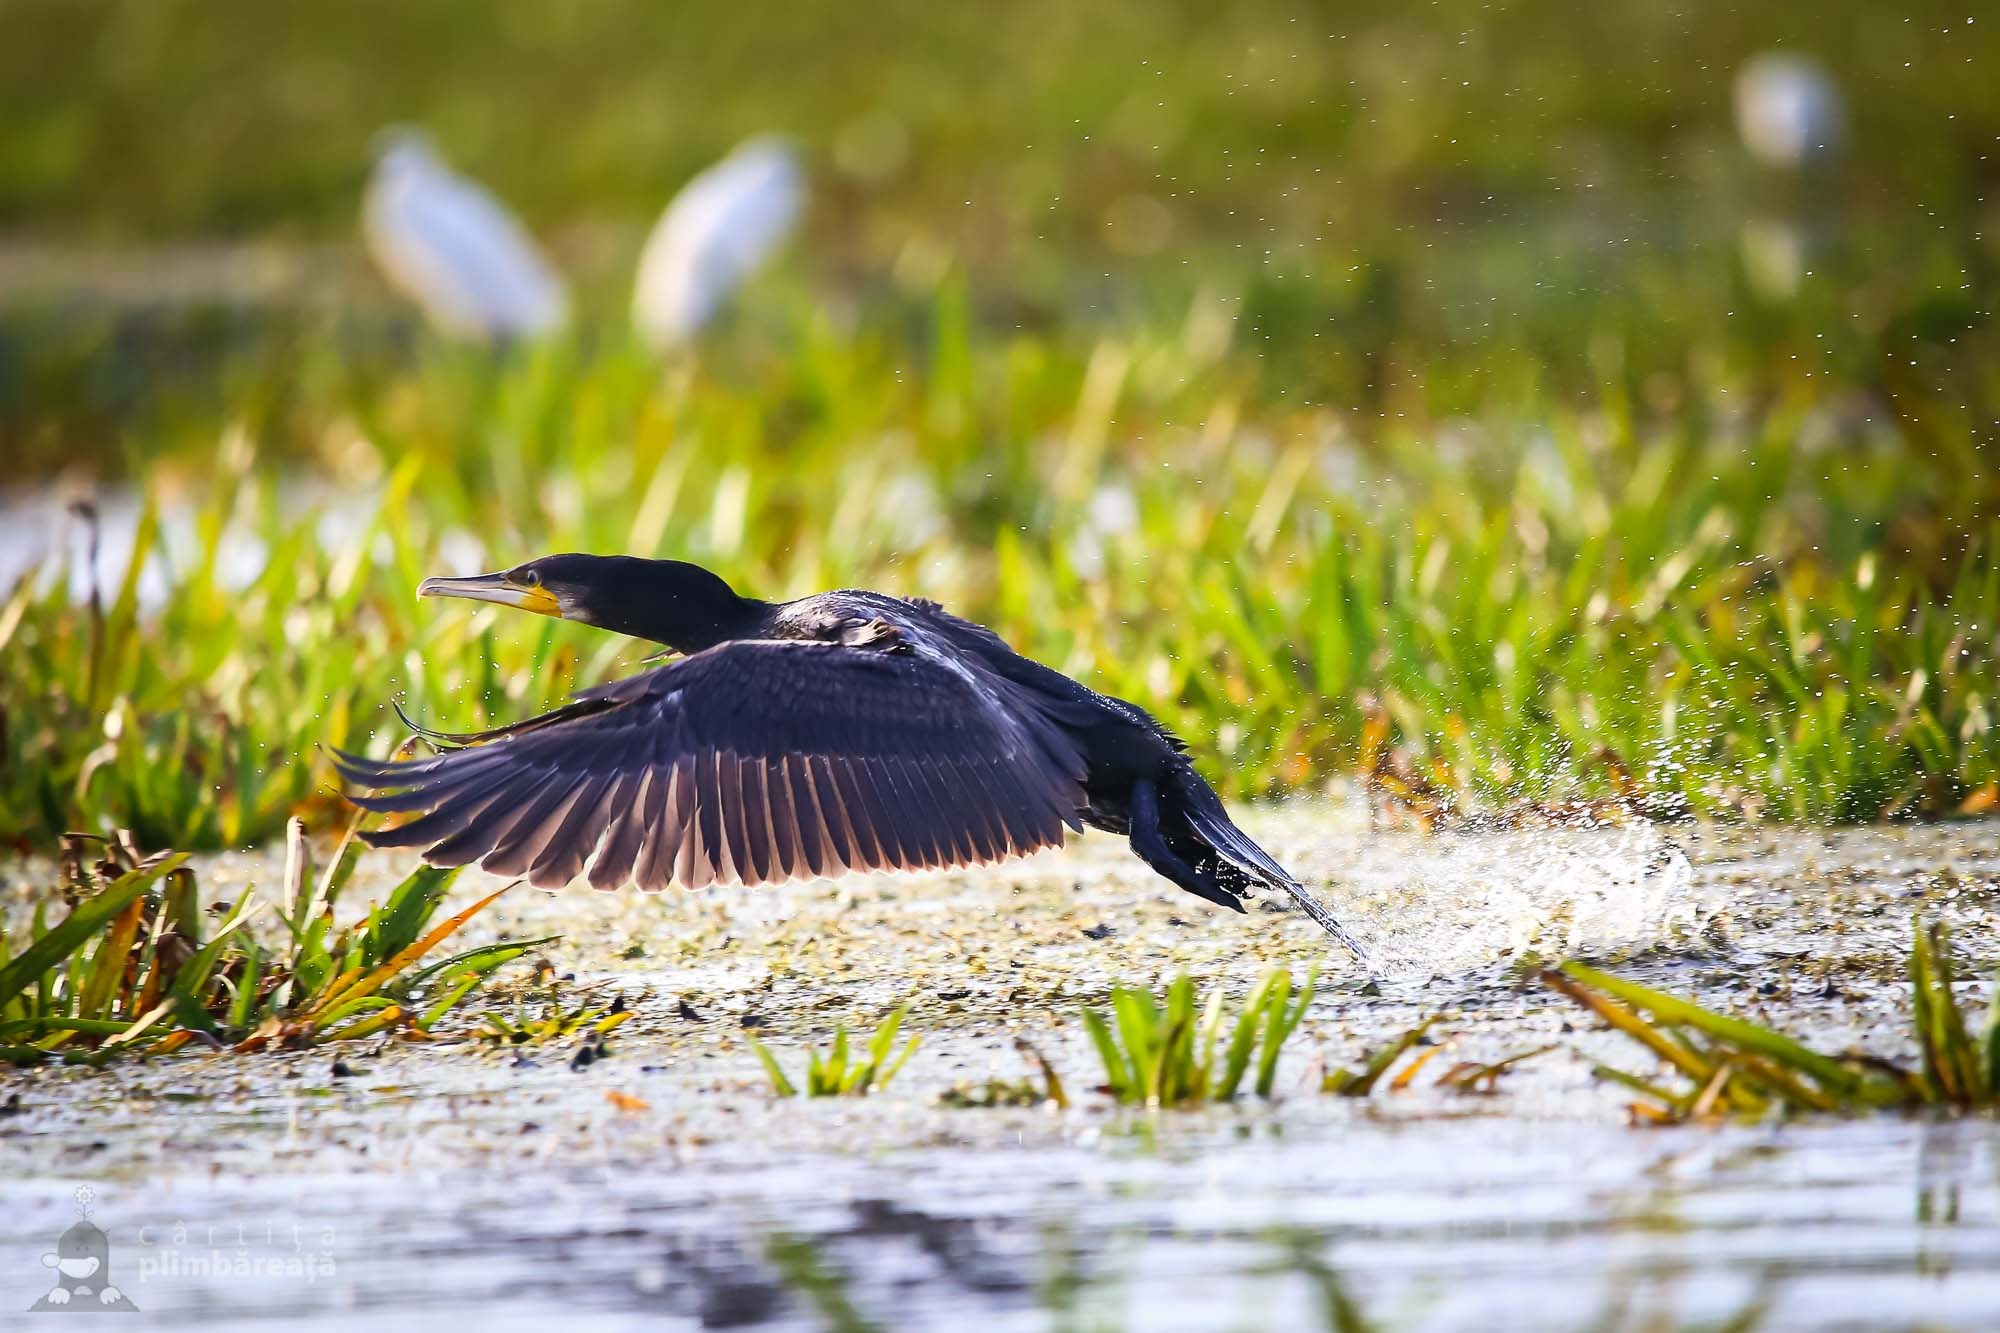 Cormoran (Phalacrocorax carbo)